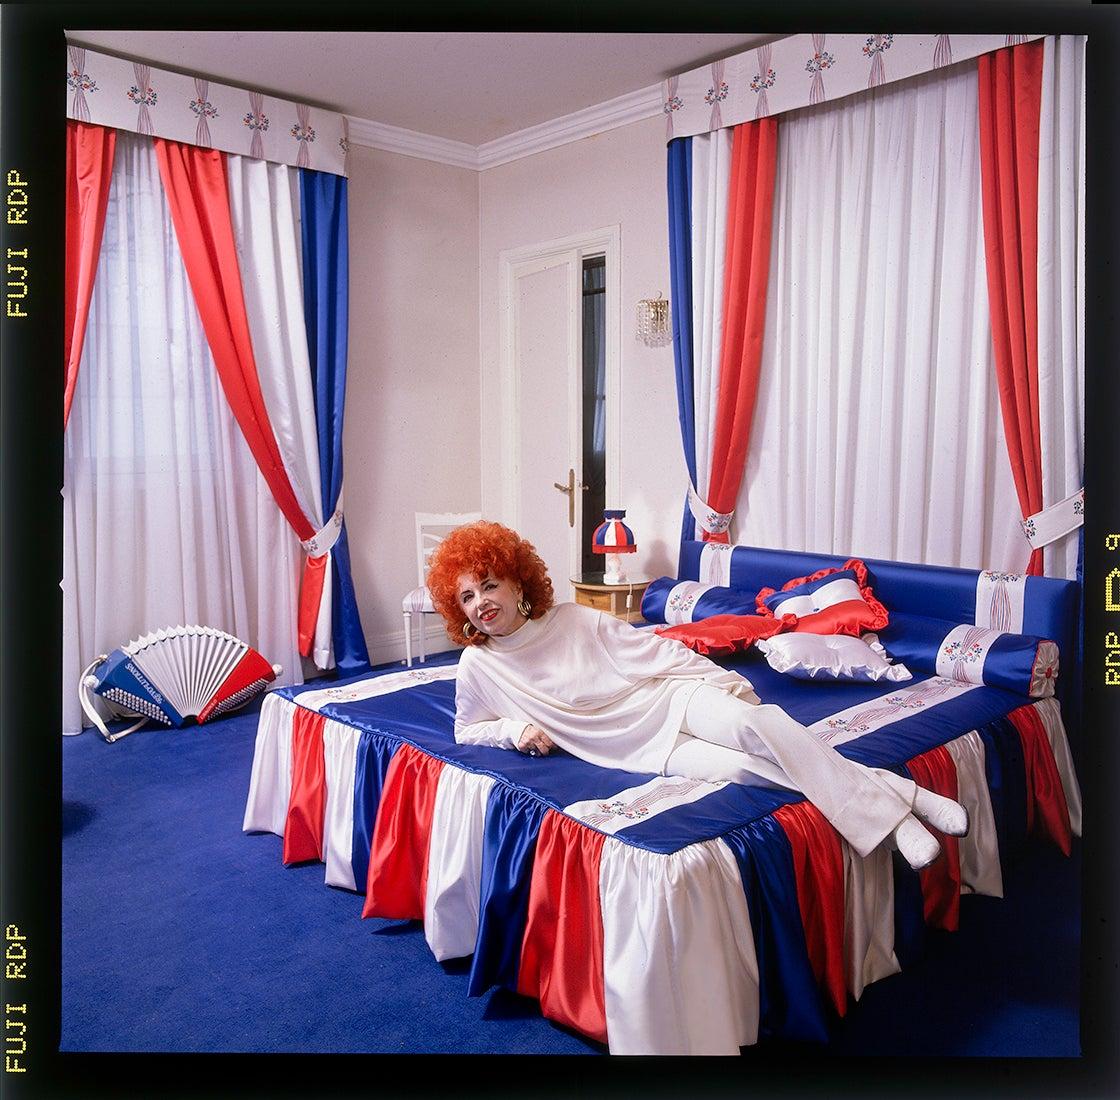 Yvette Horner, French Musician, Paris, Contemporary Color Photographic Portrait